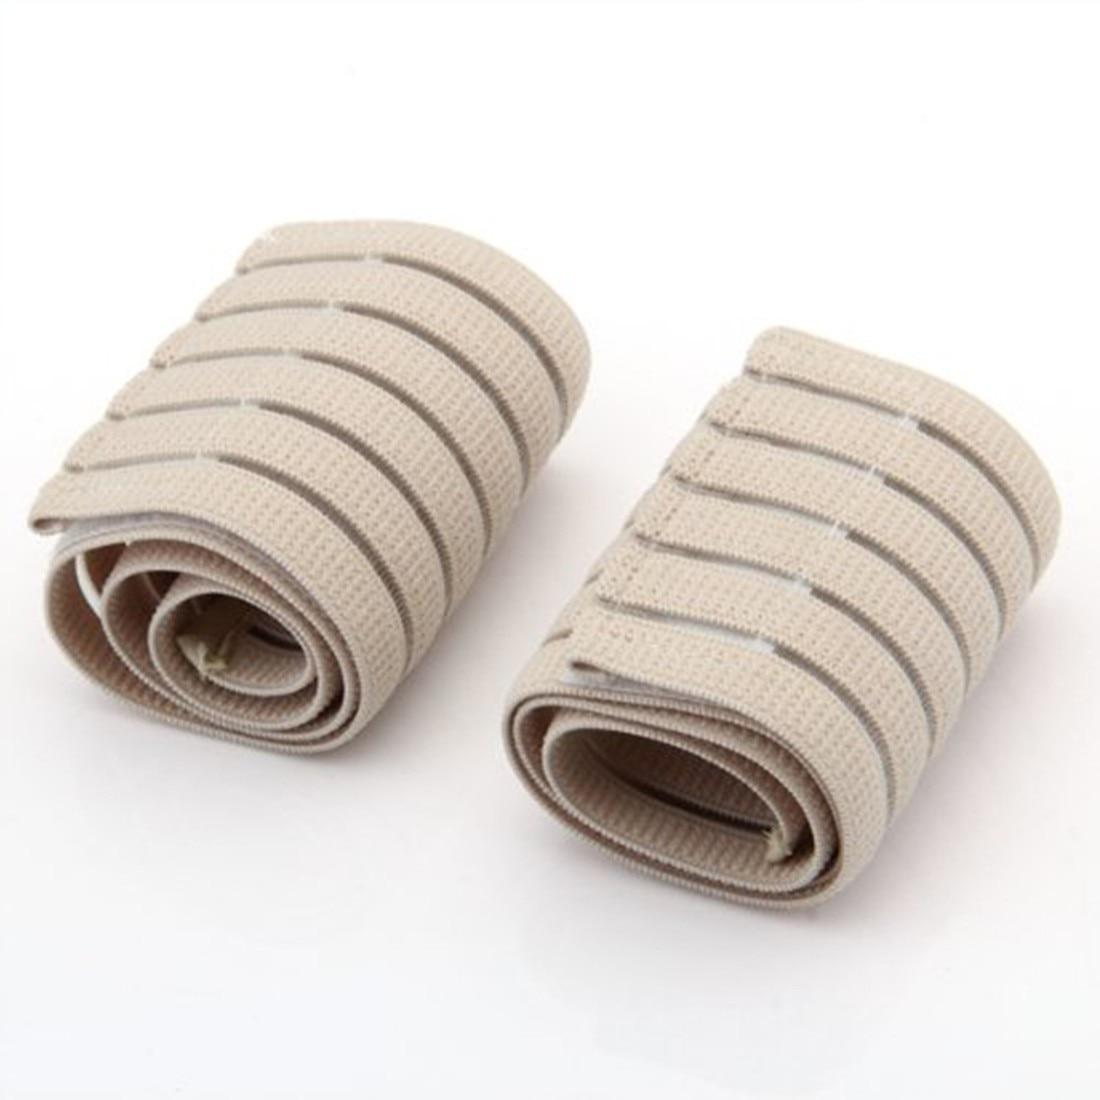 1 Pair Elastic Hand Wrist Straps Sport Wristbands Support Wrist Carpal Tunnel Wrist Brace Gym Wraps Protecter